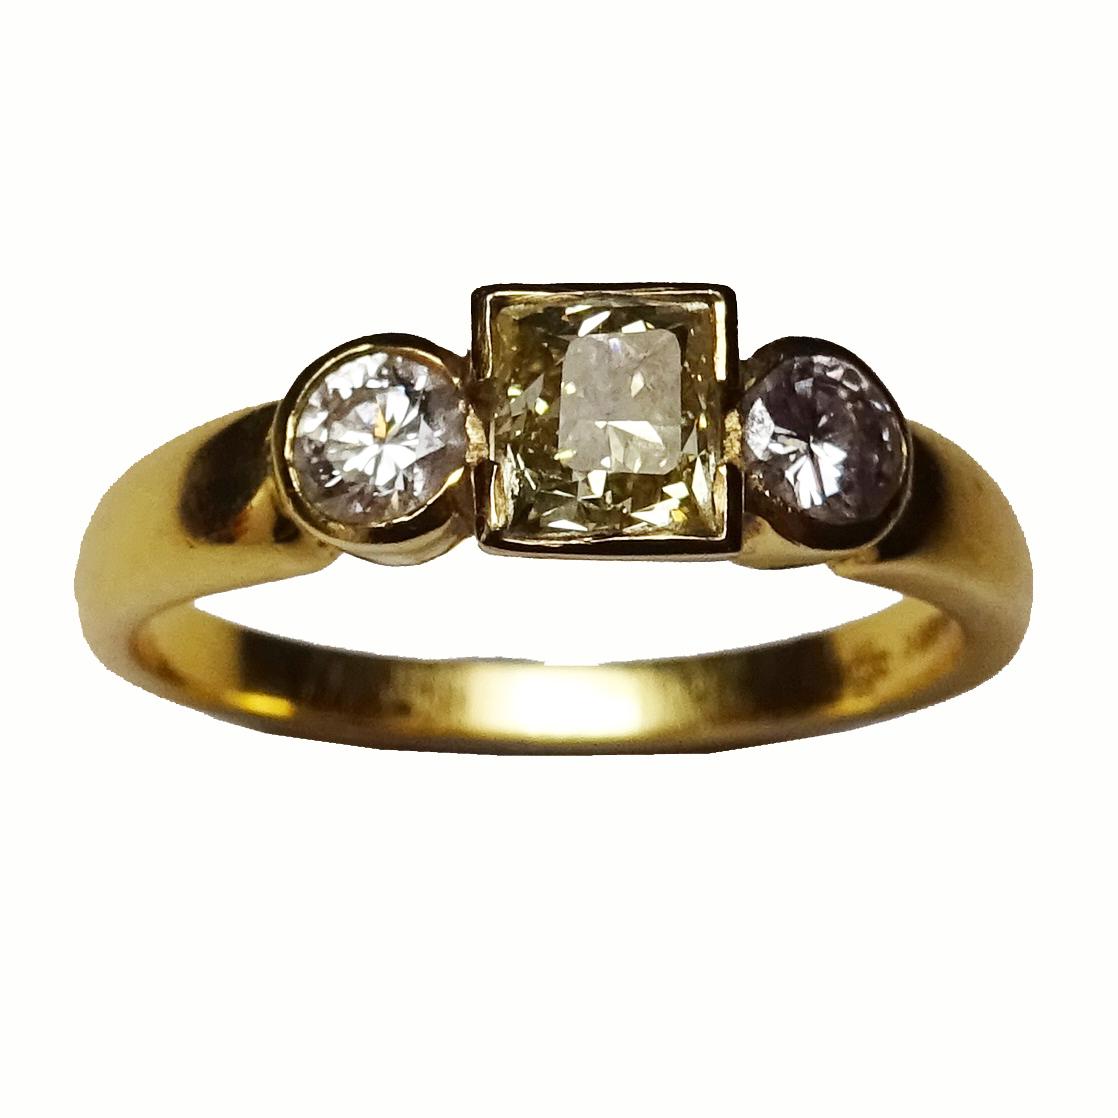 Wylde Offer 4 (Bristol): 18ct yellow gold, yellow & white diamond ring